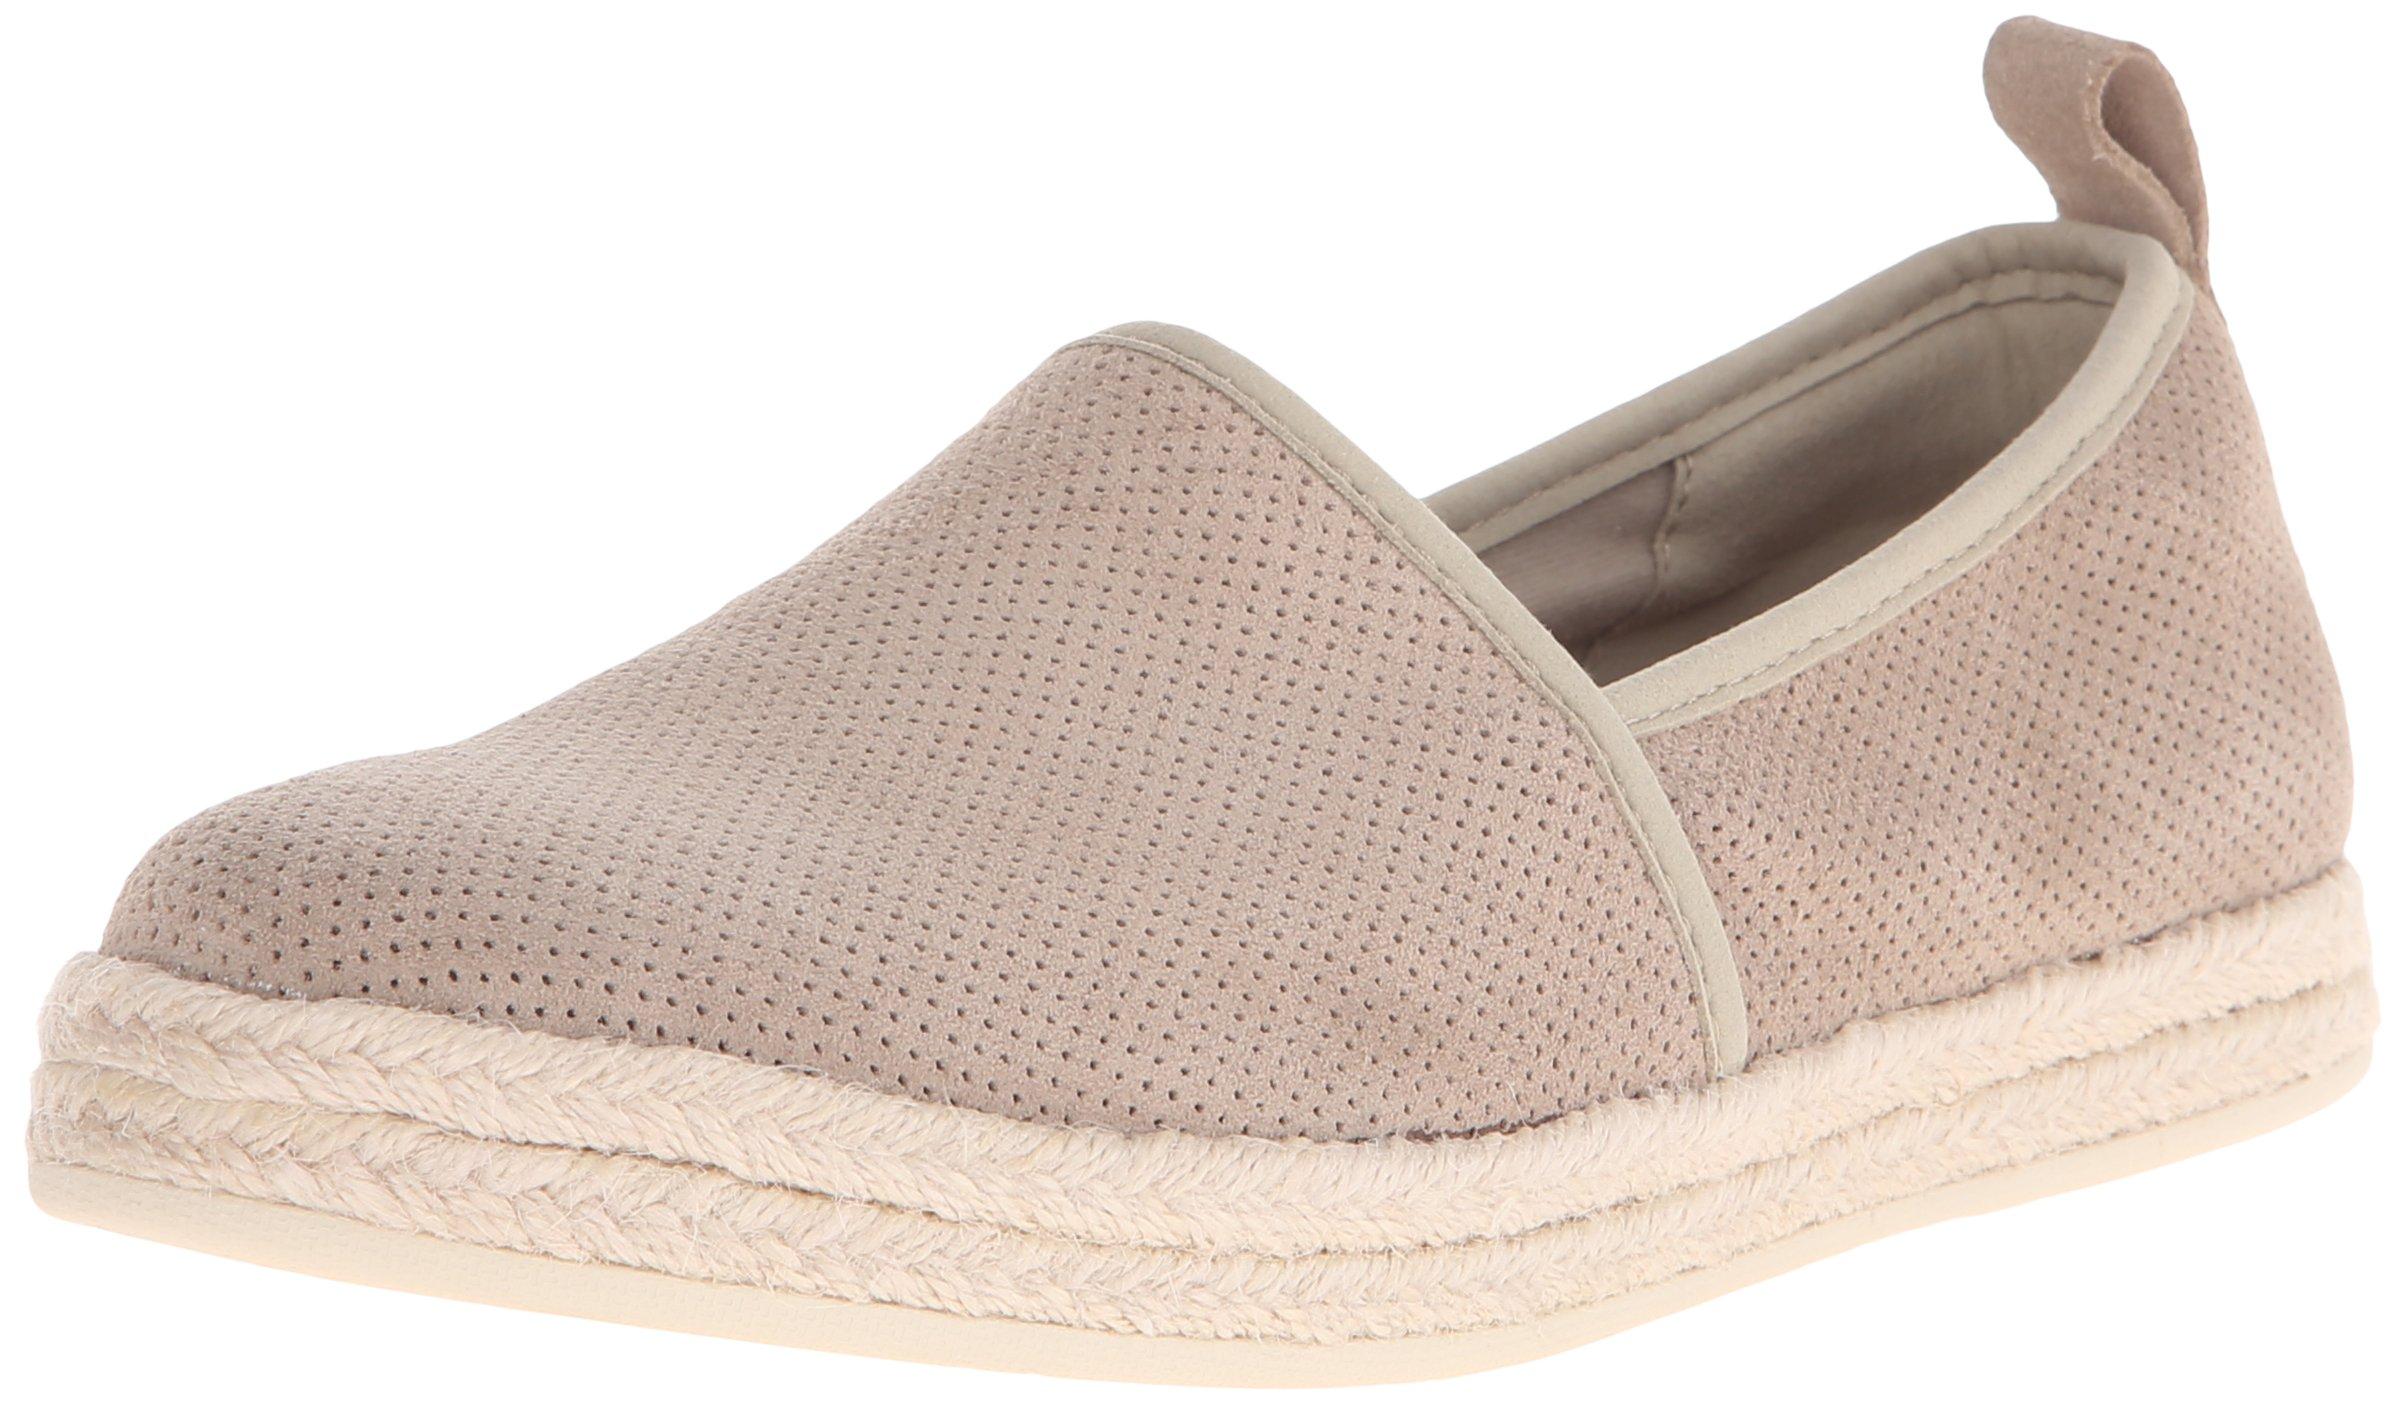 CLARKS Women's Azella Revere Shoe, Sand Suede, 8.5 Medium US